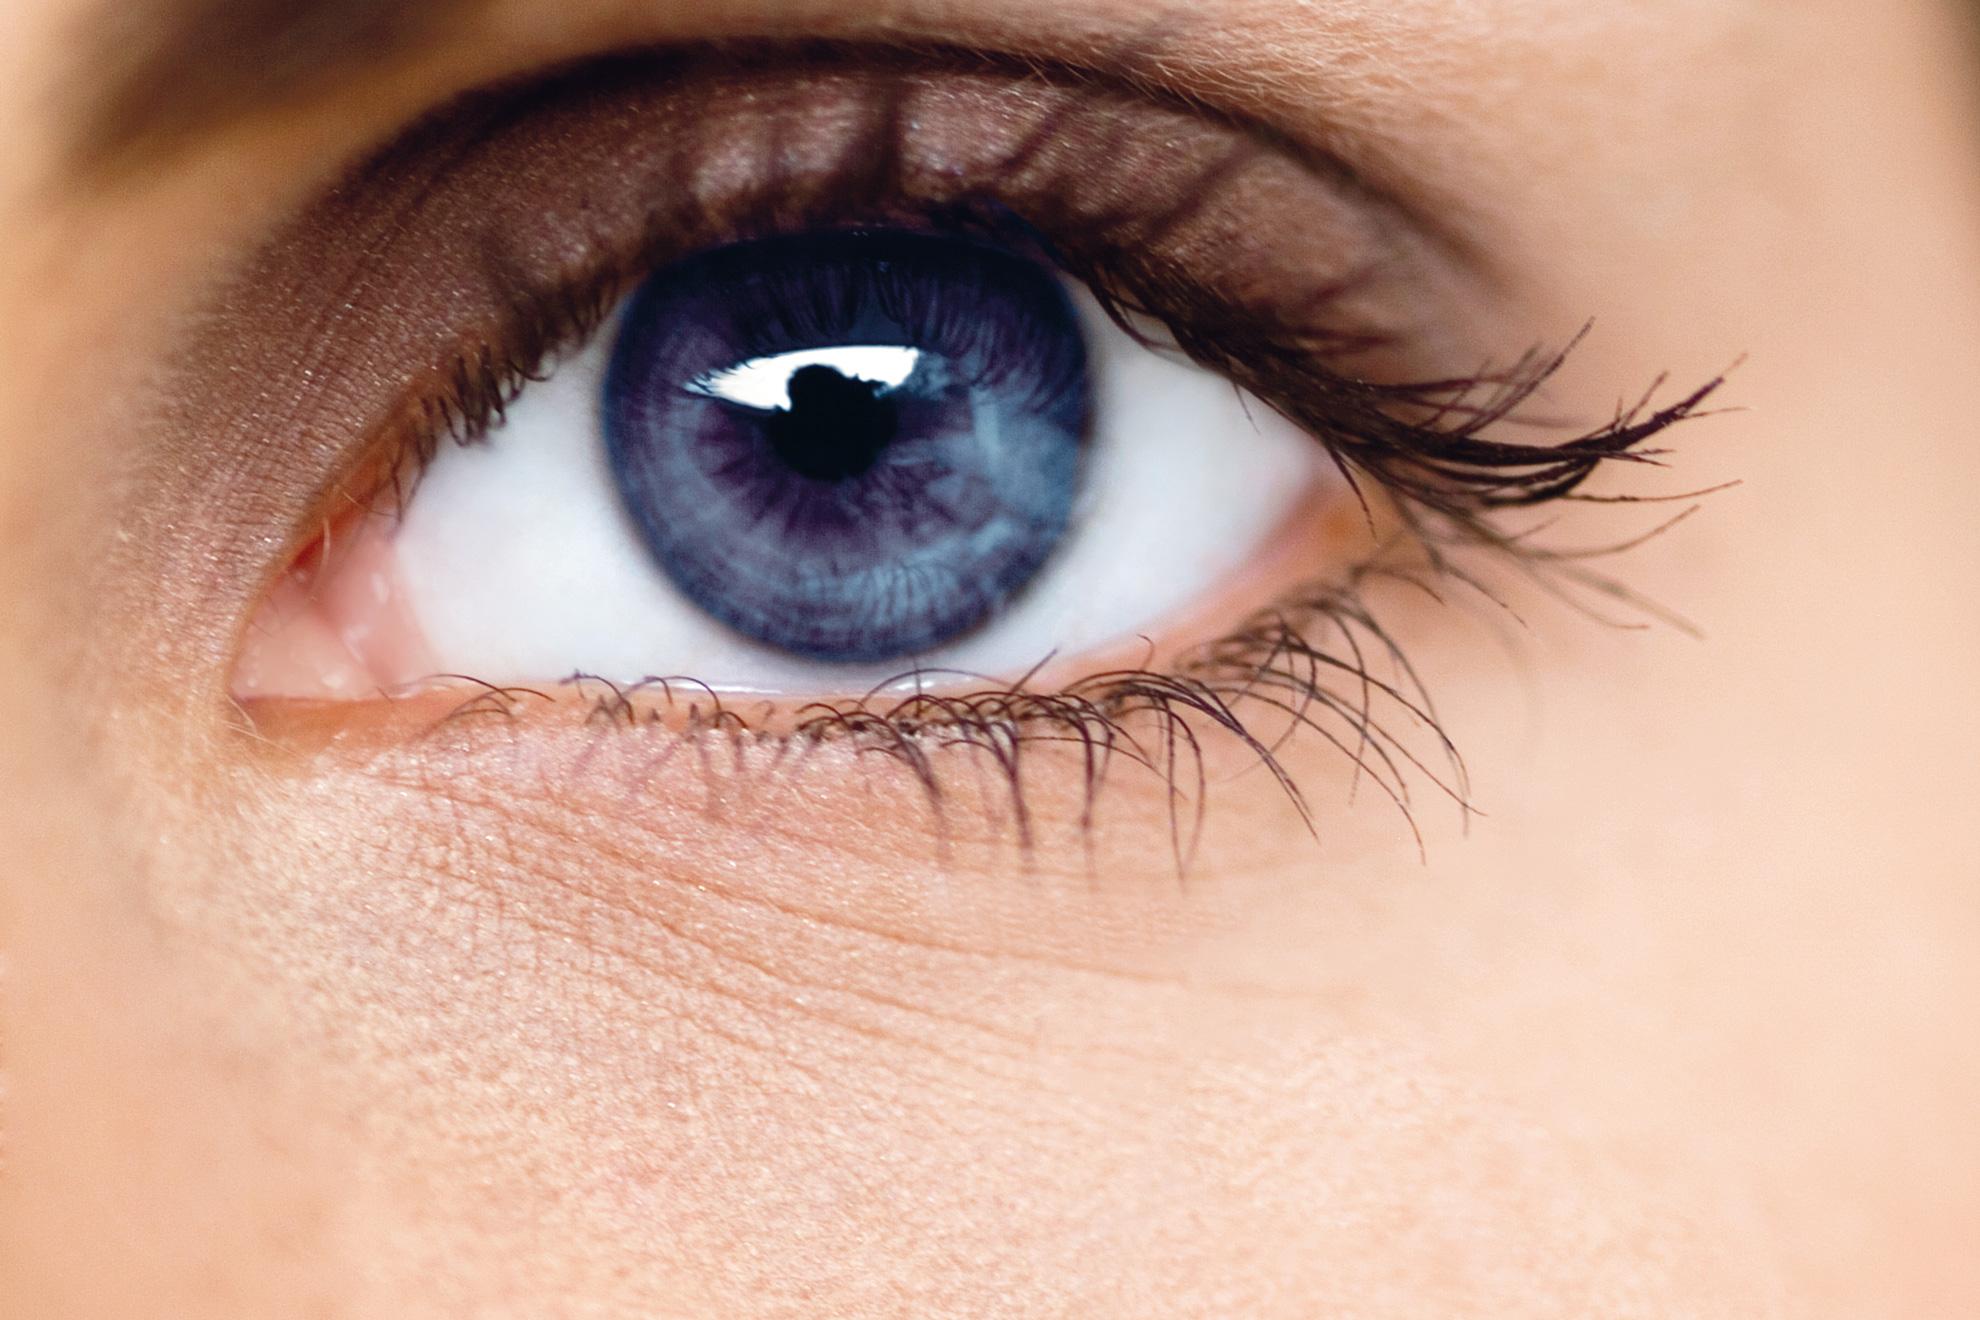 antrenament ocular pentru vedere